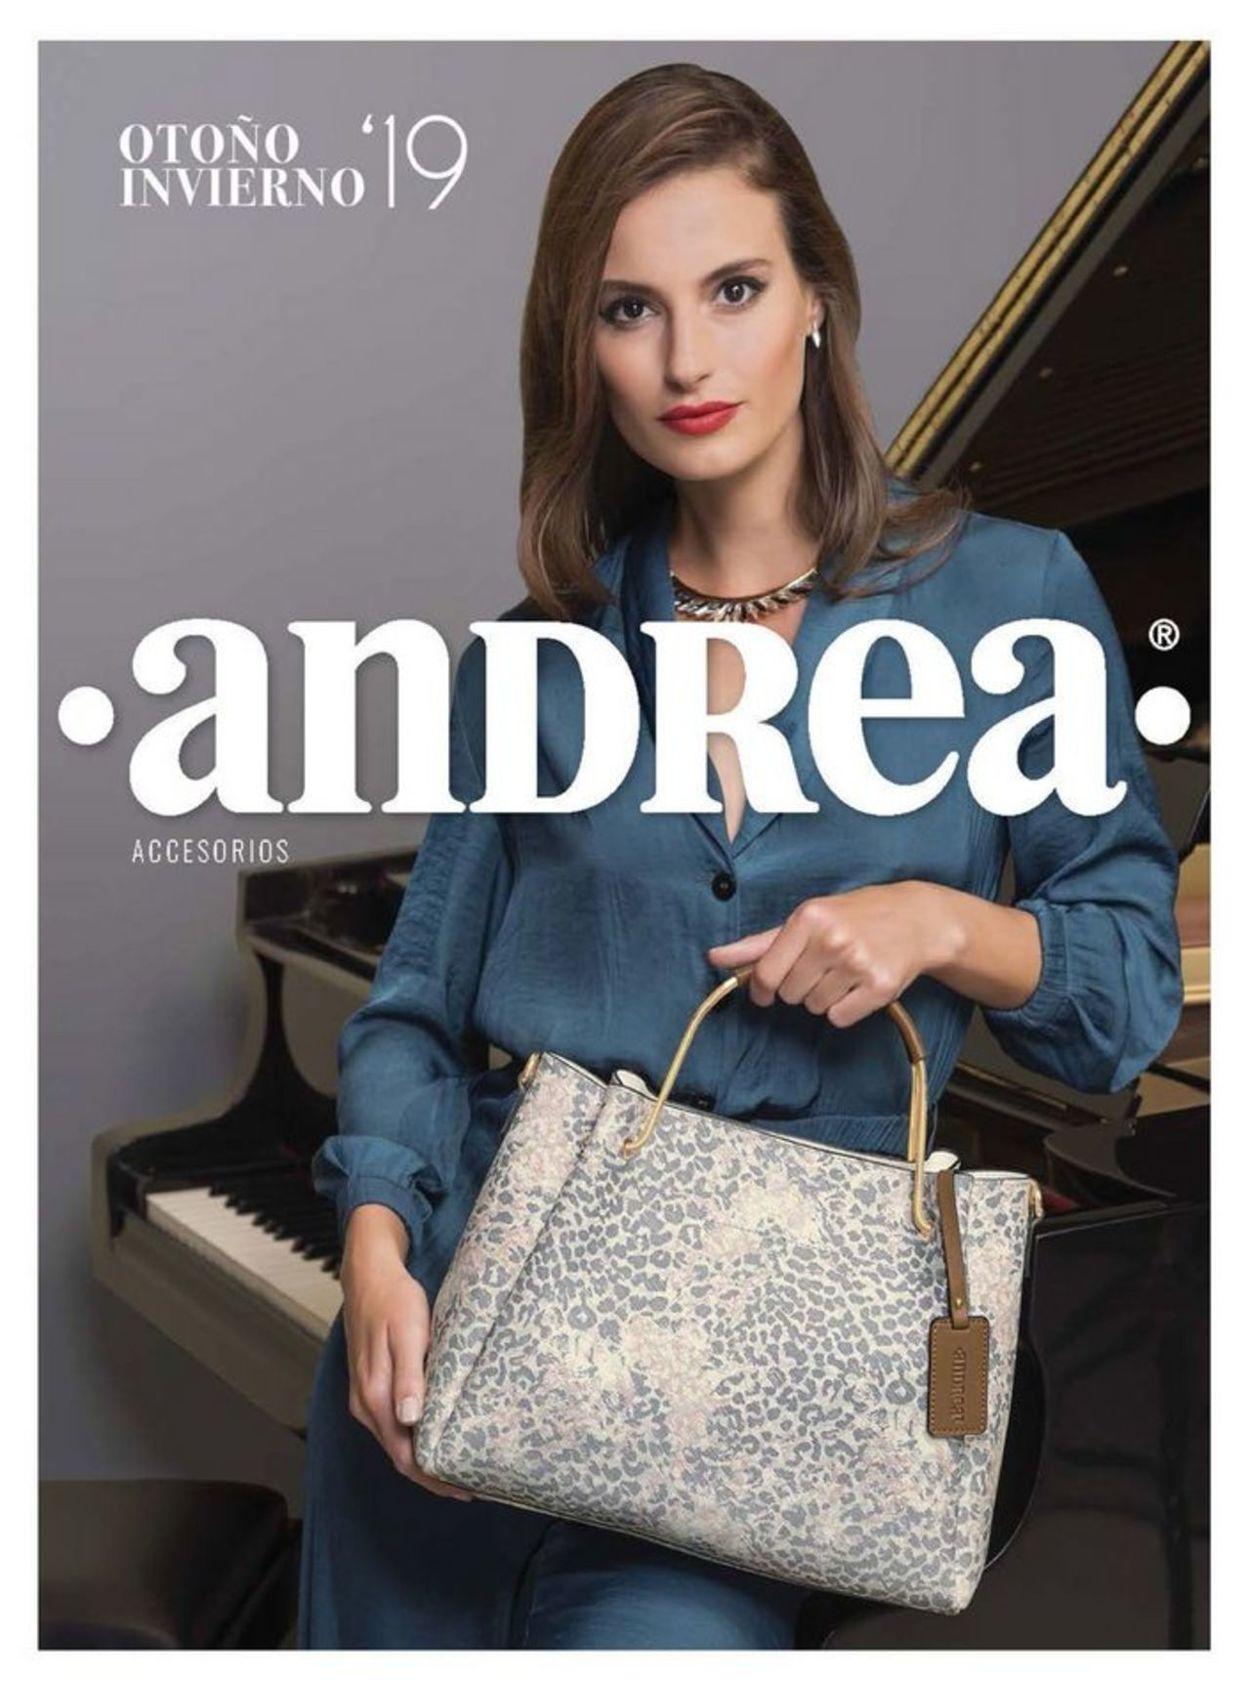 Andrea Folleto - 26.08-25.03.2020